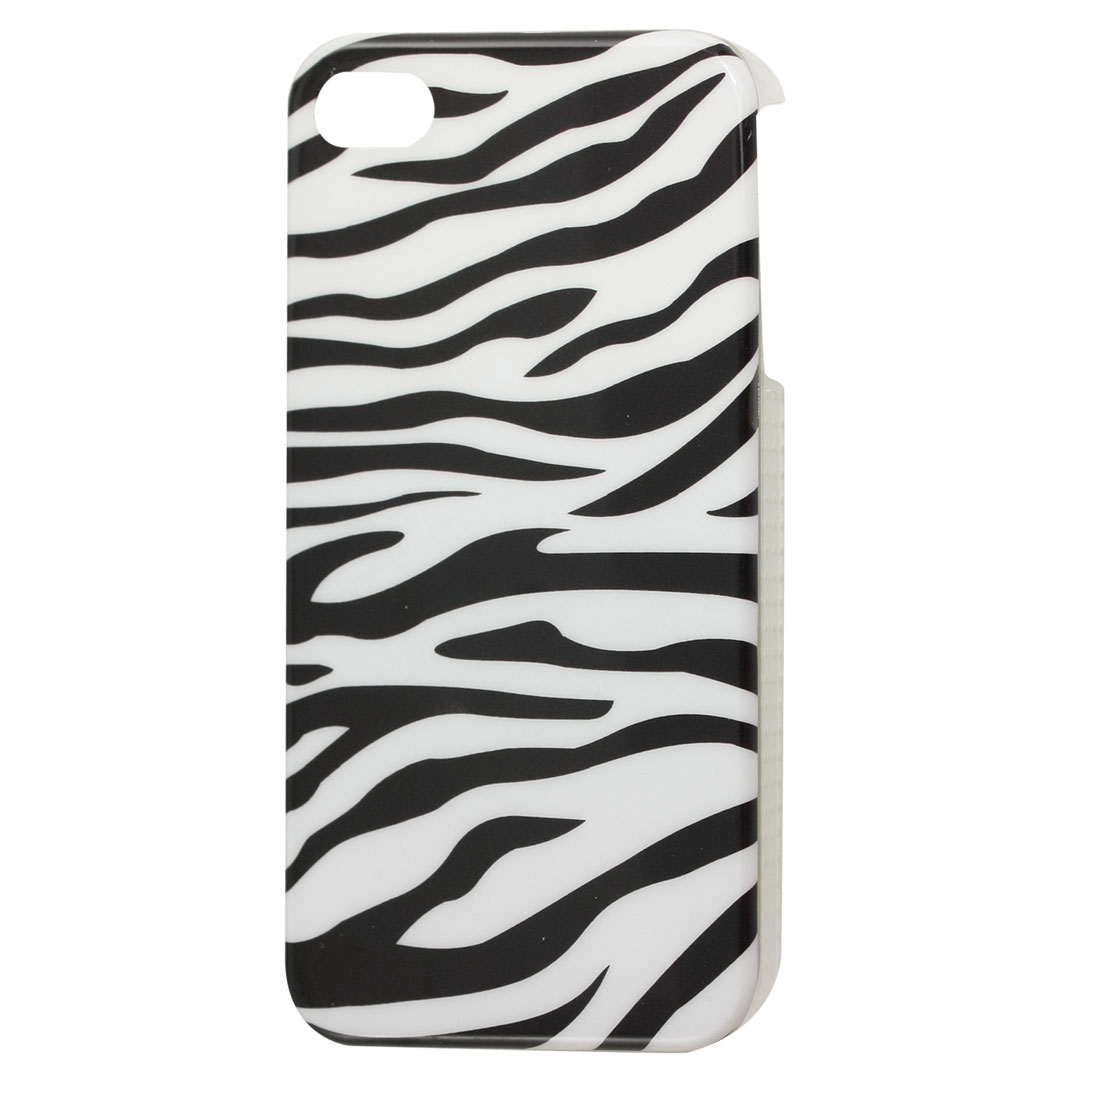 Protective Zebra Stripe IMD Hard Plastic Back Case for iPhone 4 4G 4S